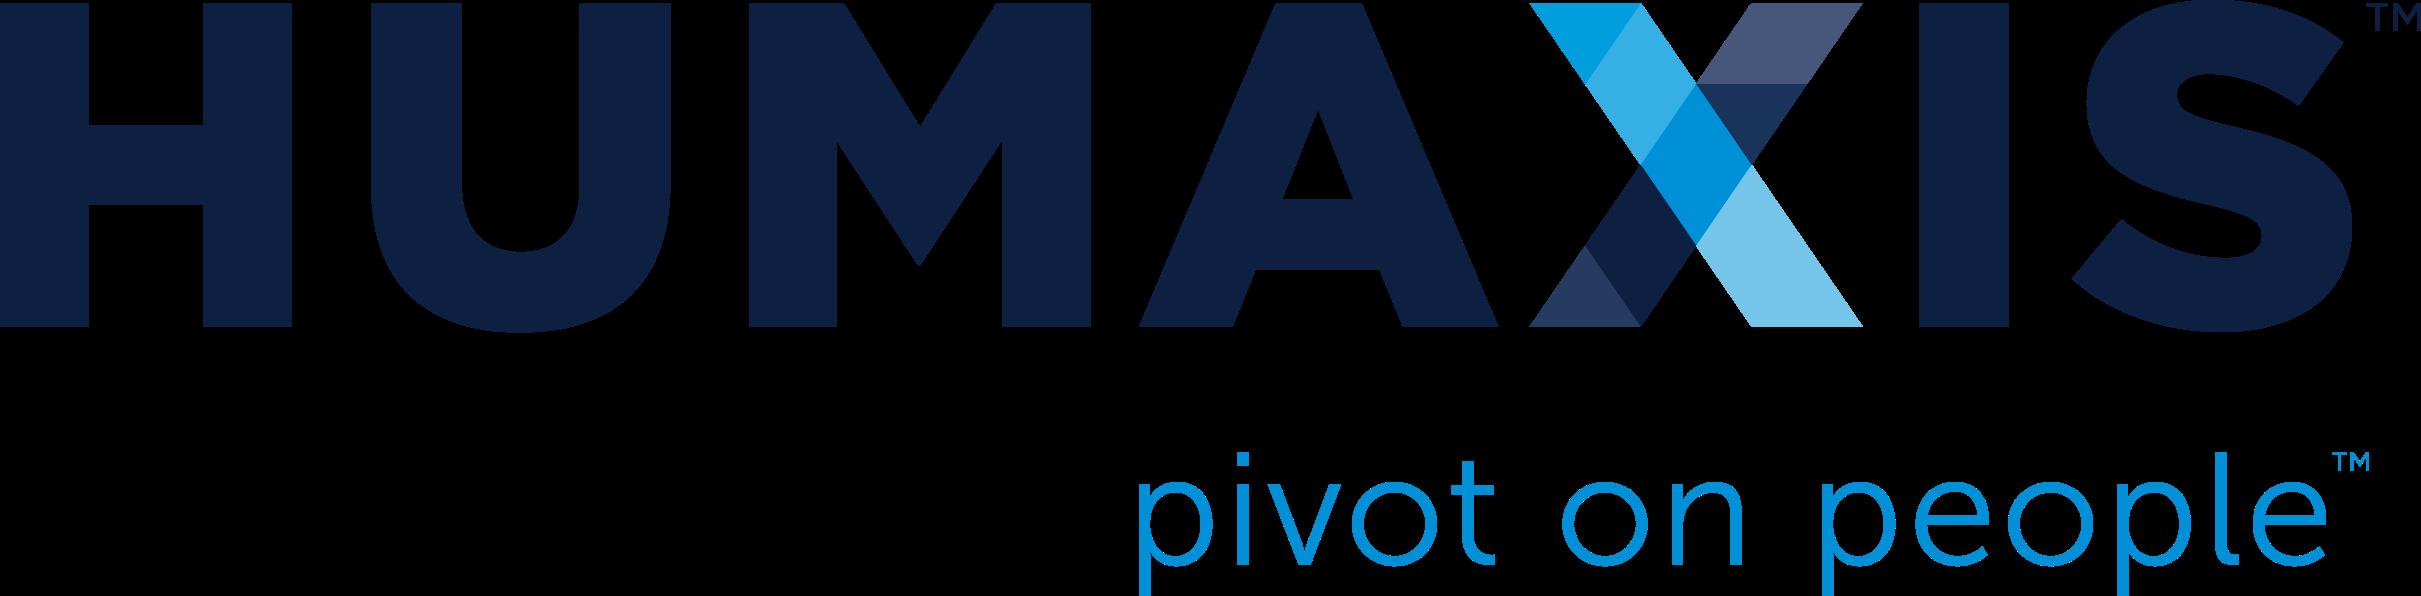 Humaxis Logo